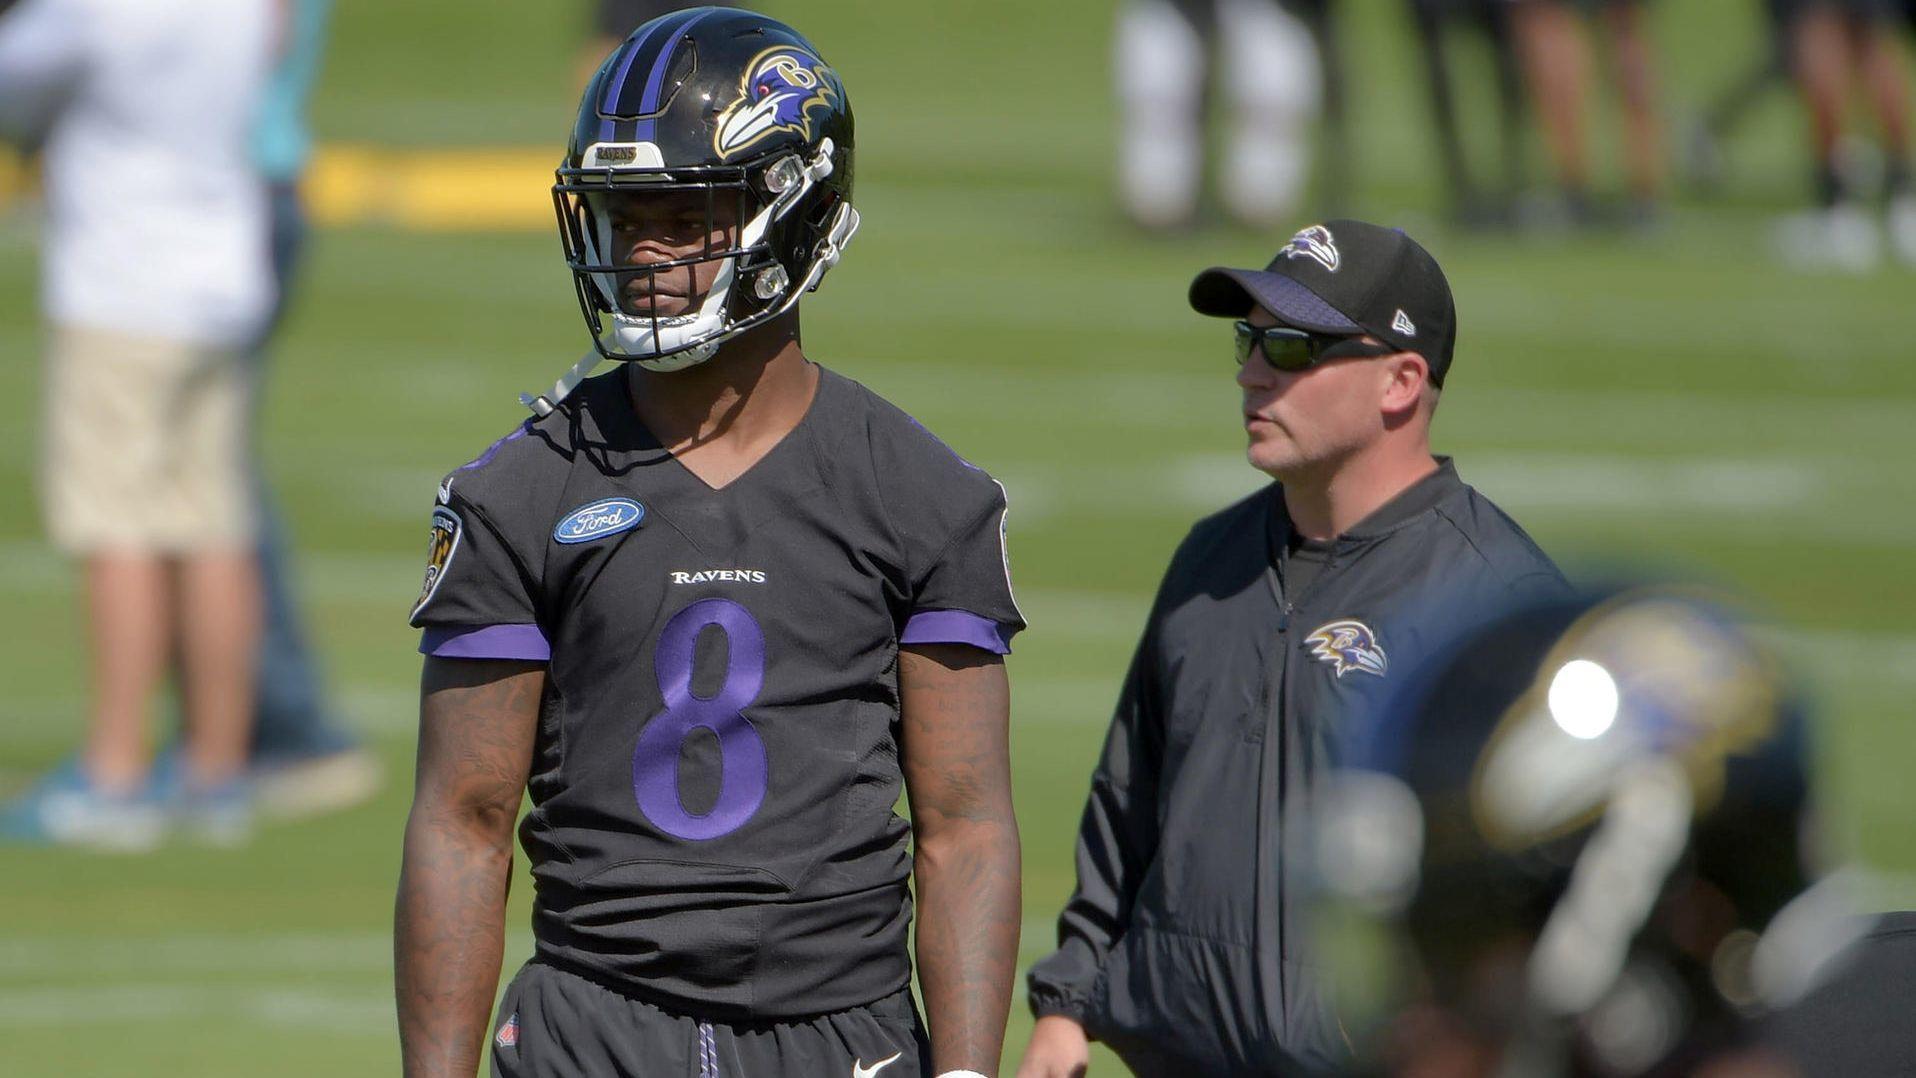 Bs-sp-james-urban-ravens-quarterback-coach-20180703